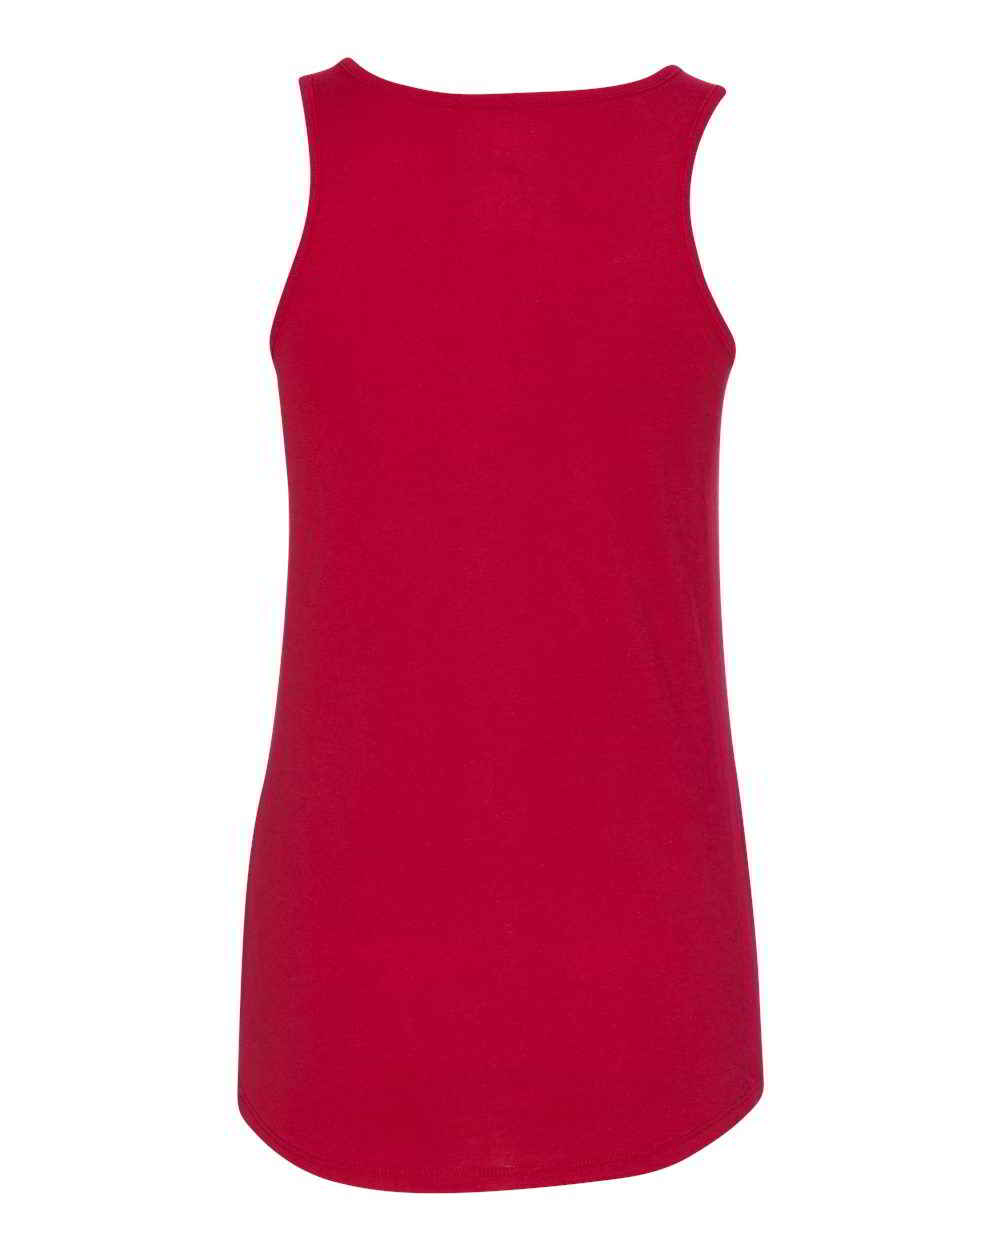 Hanes-Ladies-Moisture-Wicking-Shirts-Sleeveless-X-Temp-Women-039-s-Tank-Top thumbnail 7